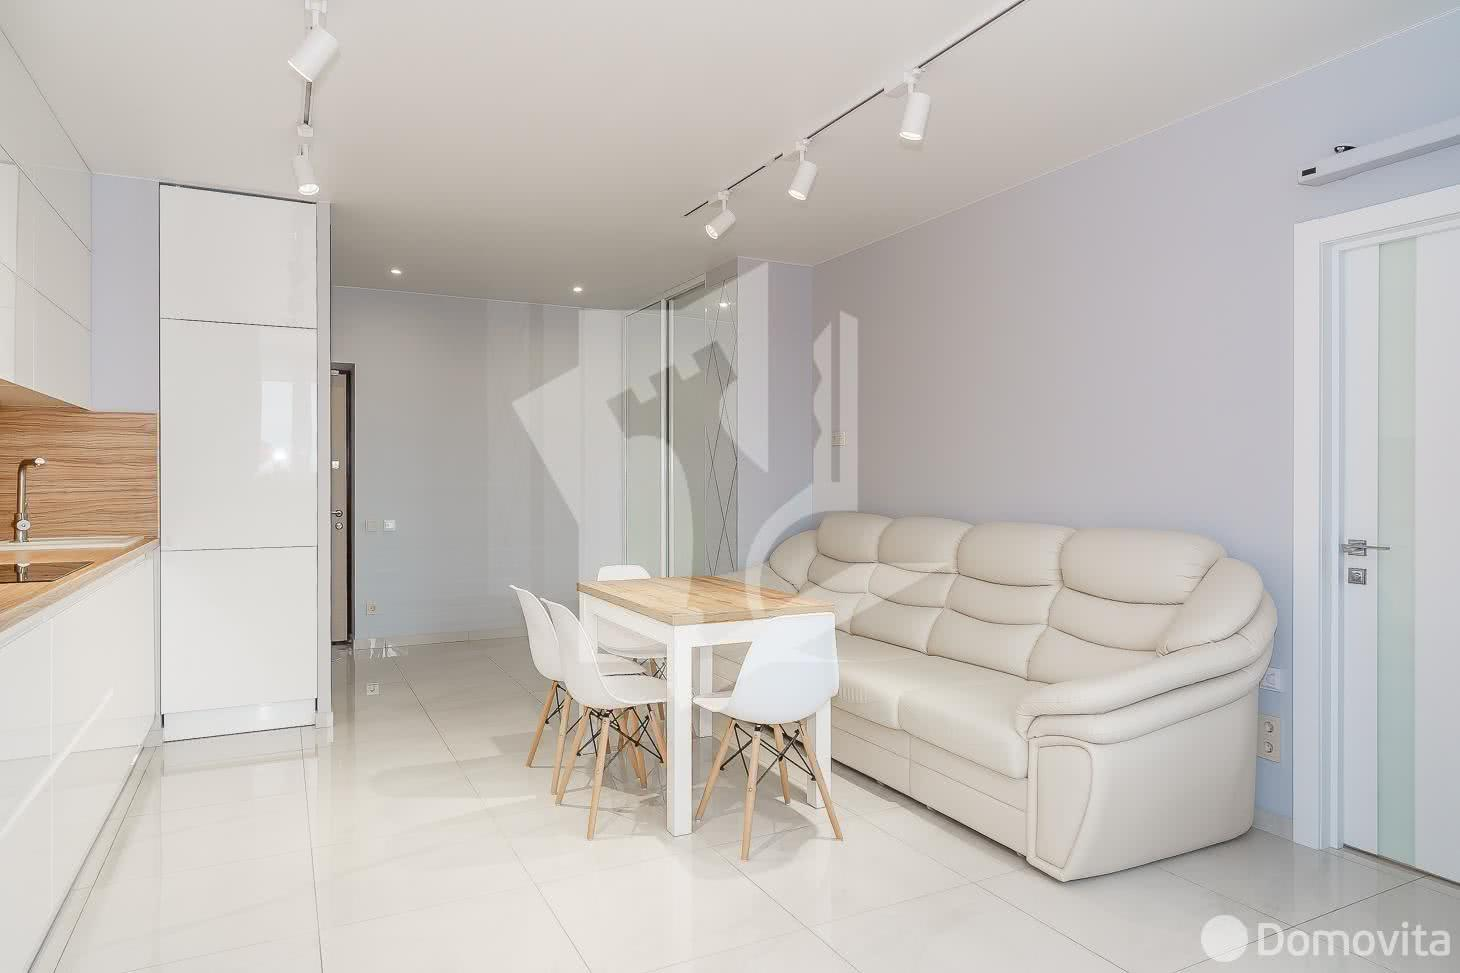 Снять 3-комнатную квартиру в Минске, ул. Мястровская, д. 28 - фото 6